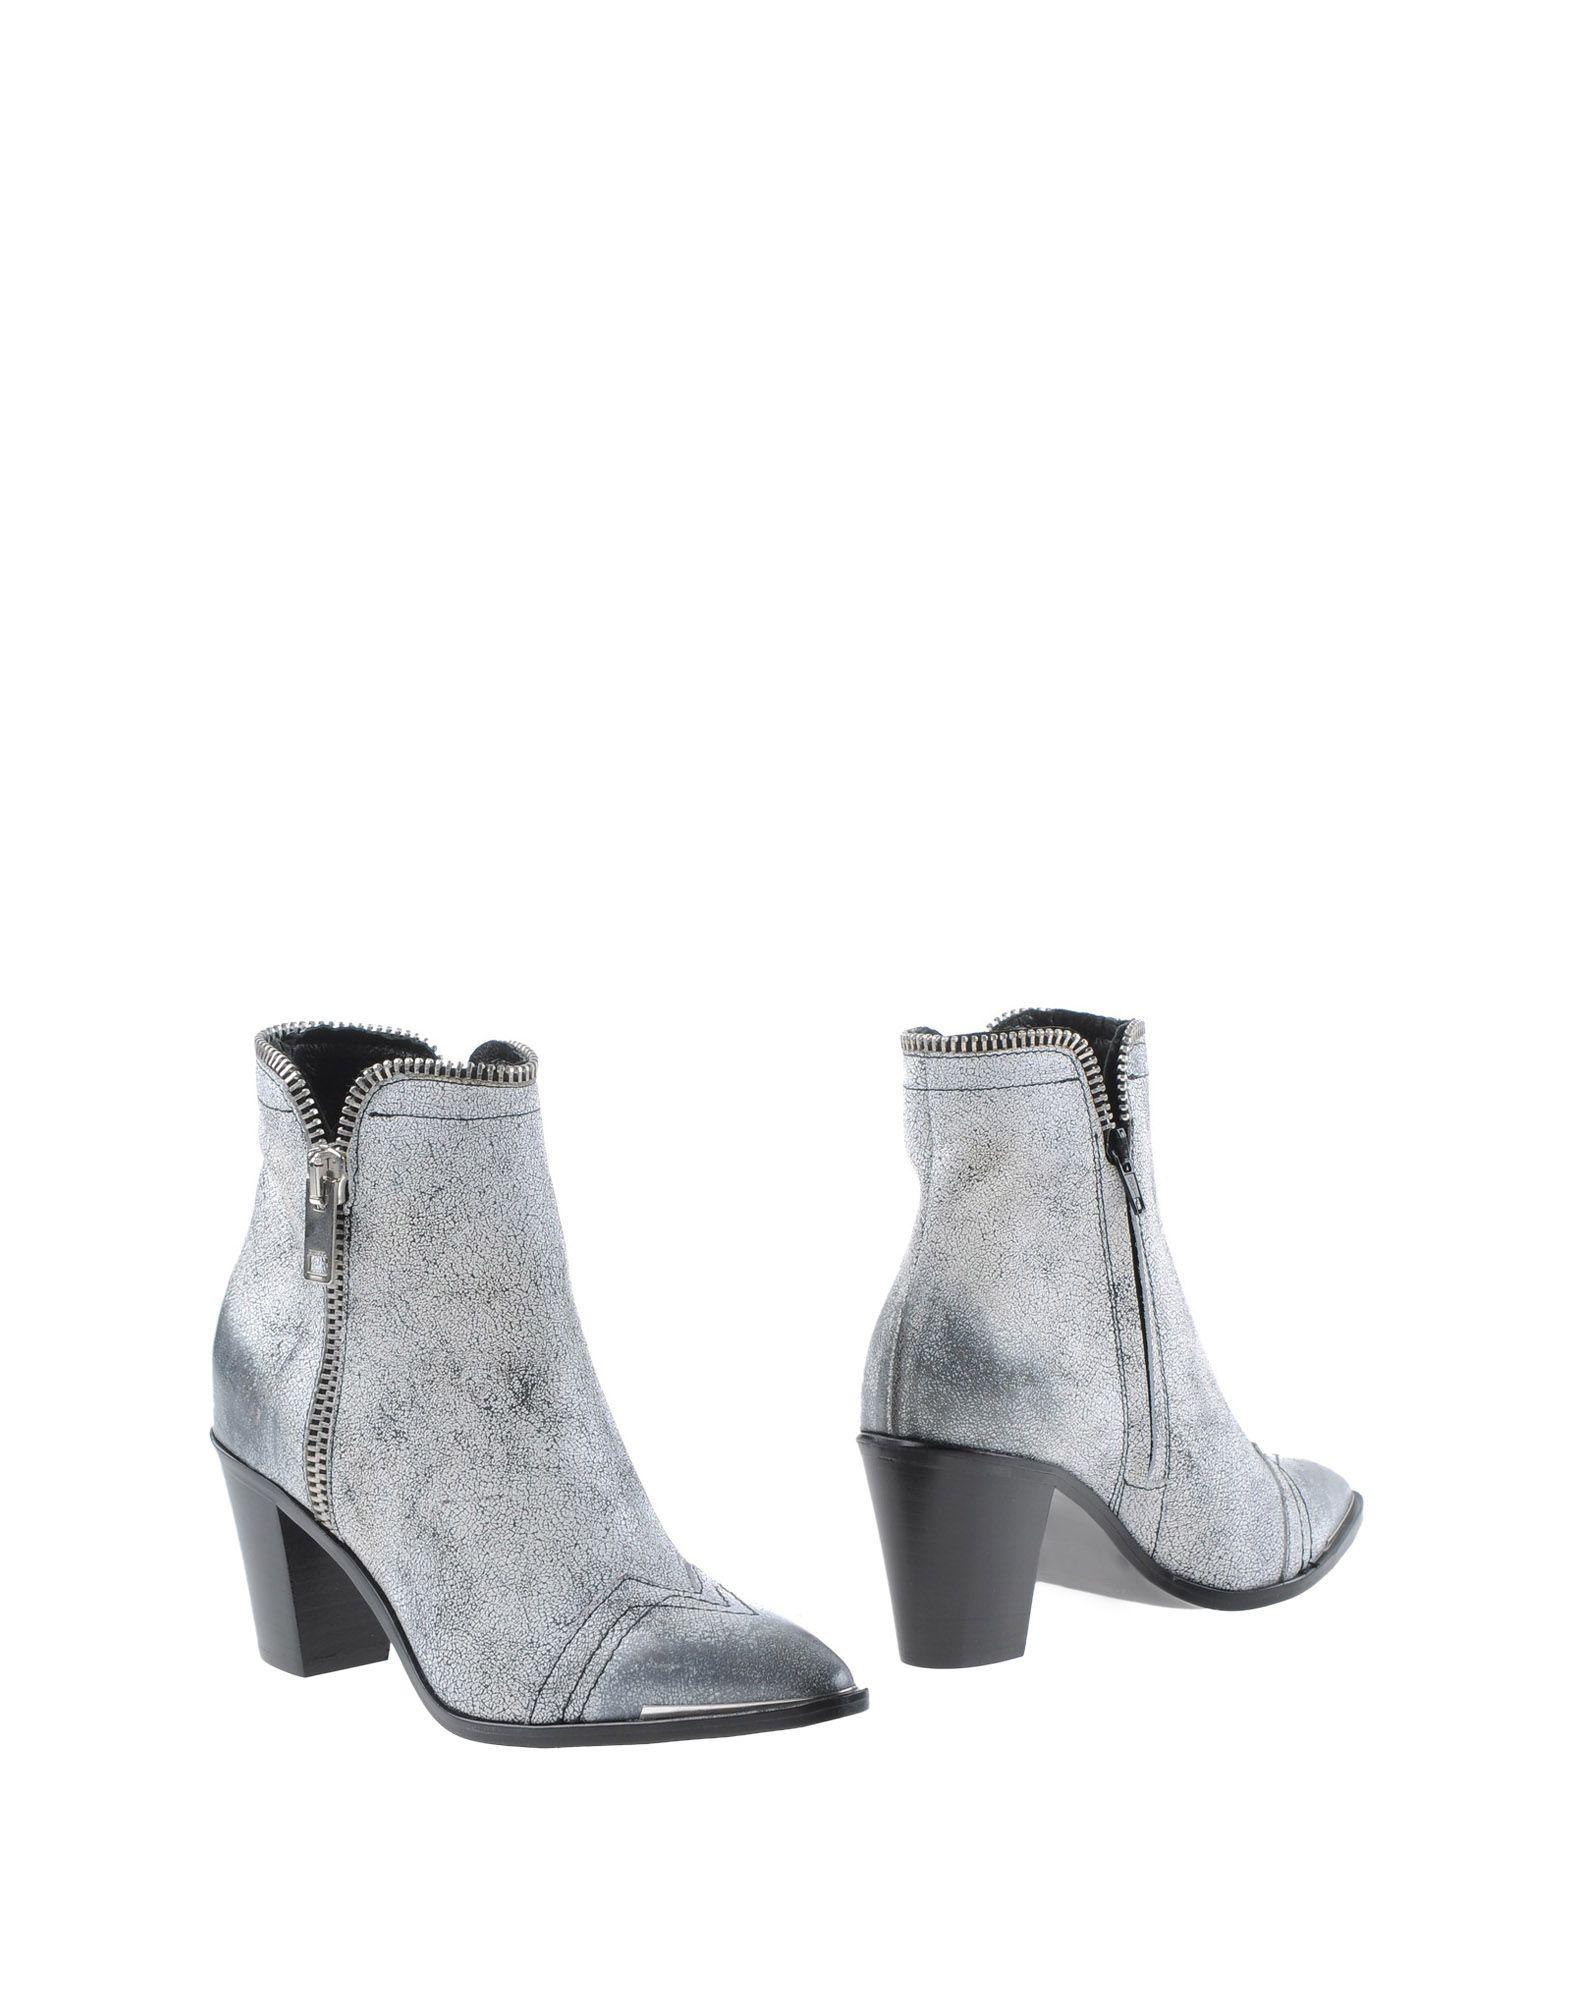 Diesel Ankle Boot - Women Diesel Ankle Boots - online on  Australia - Boots 11325784VT e3f106